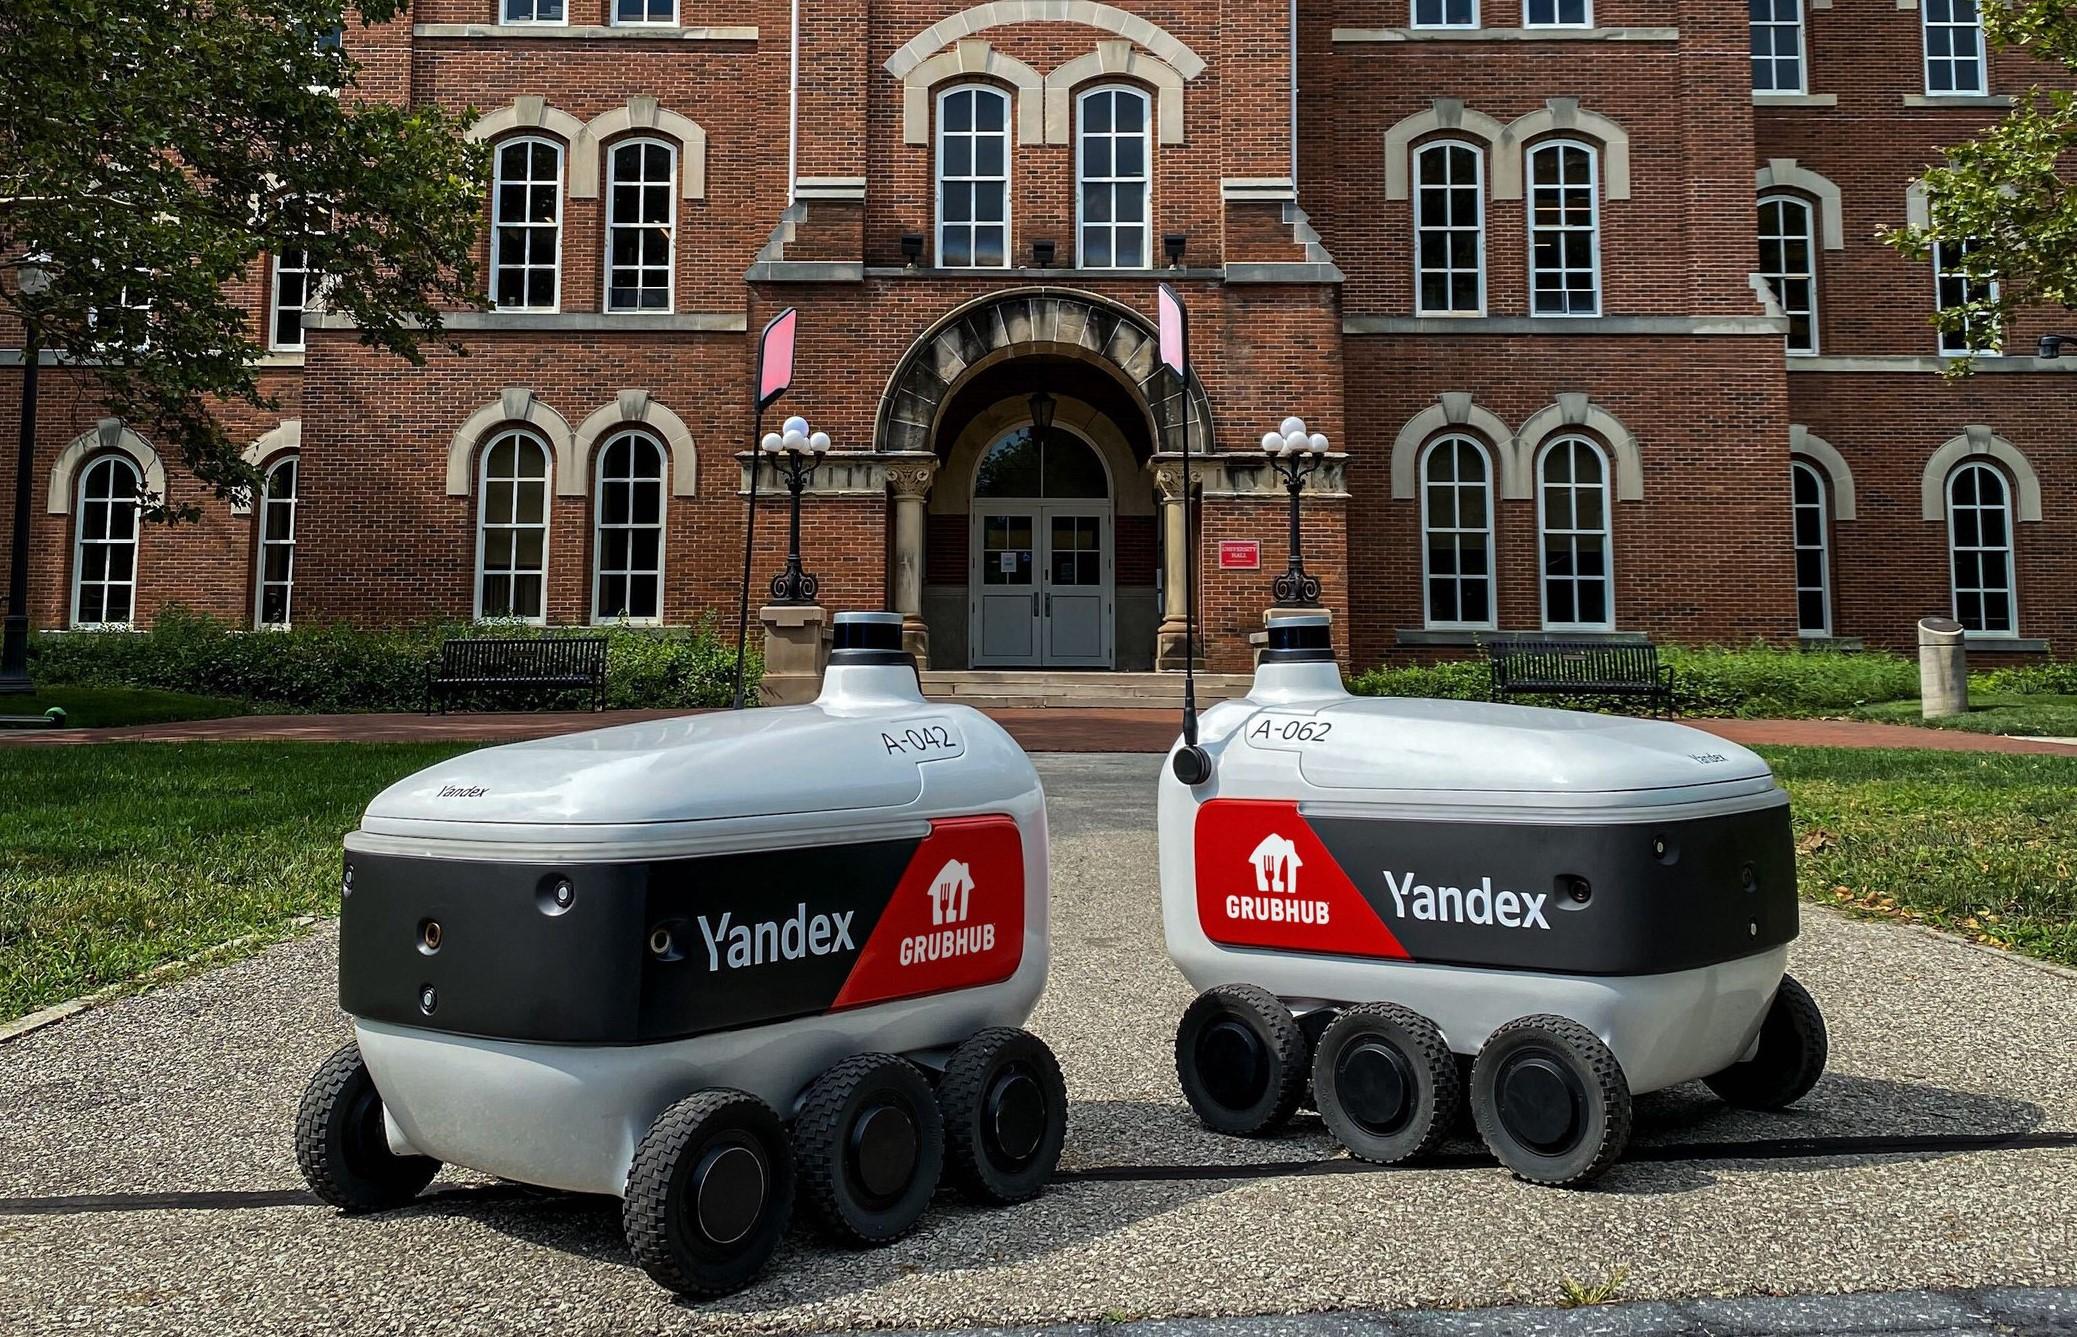 Yandex robots at Ohio State